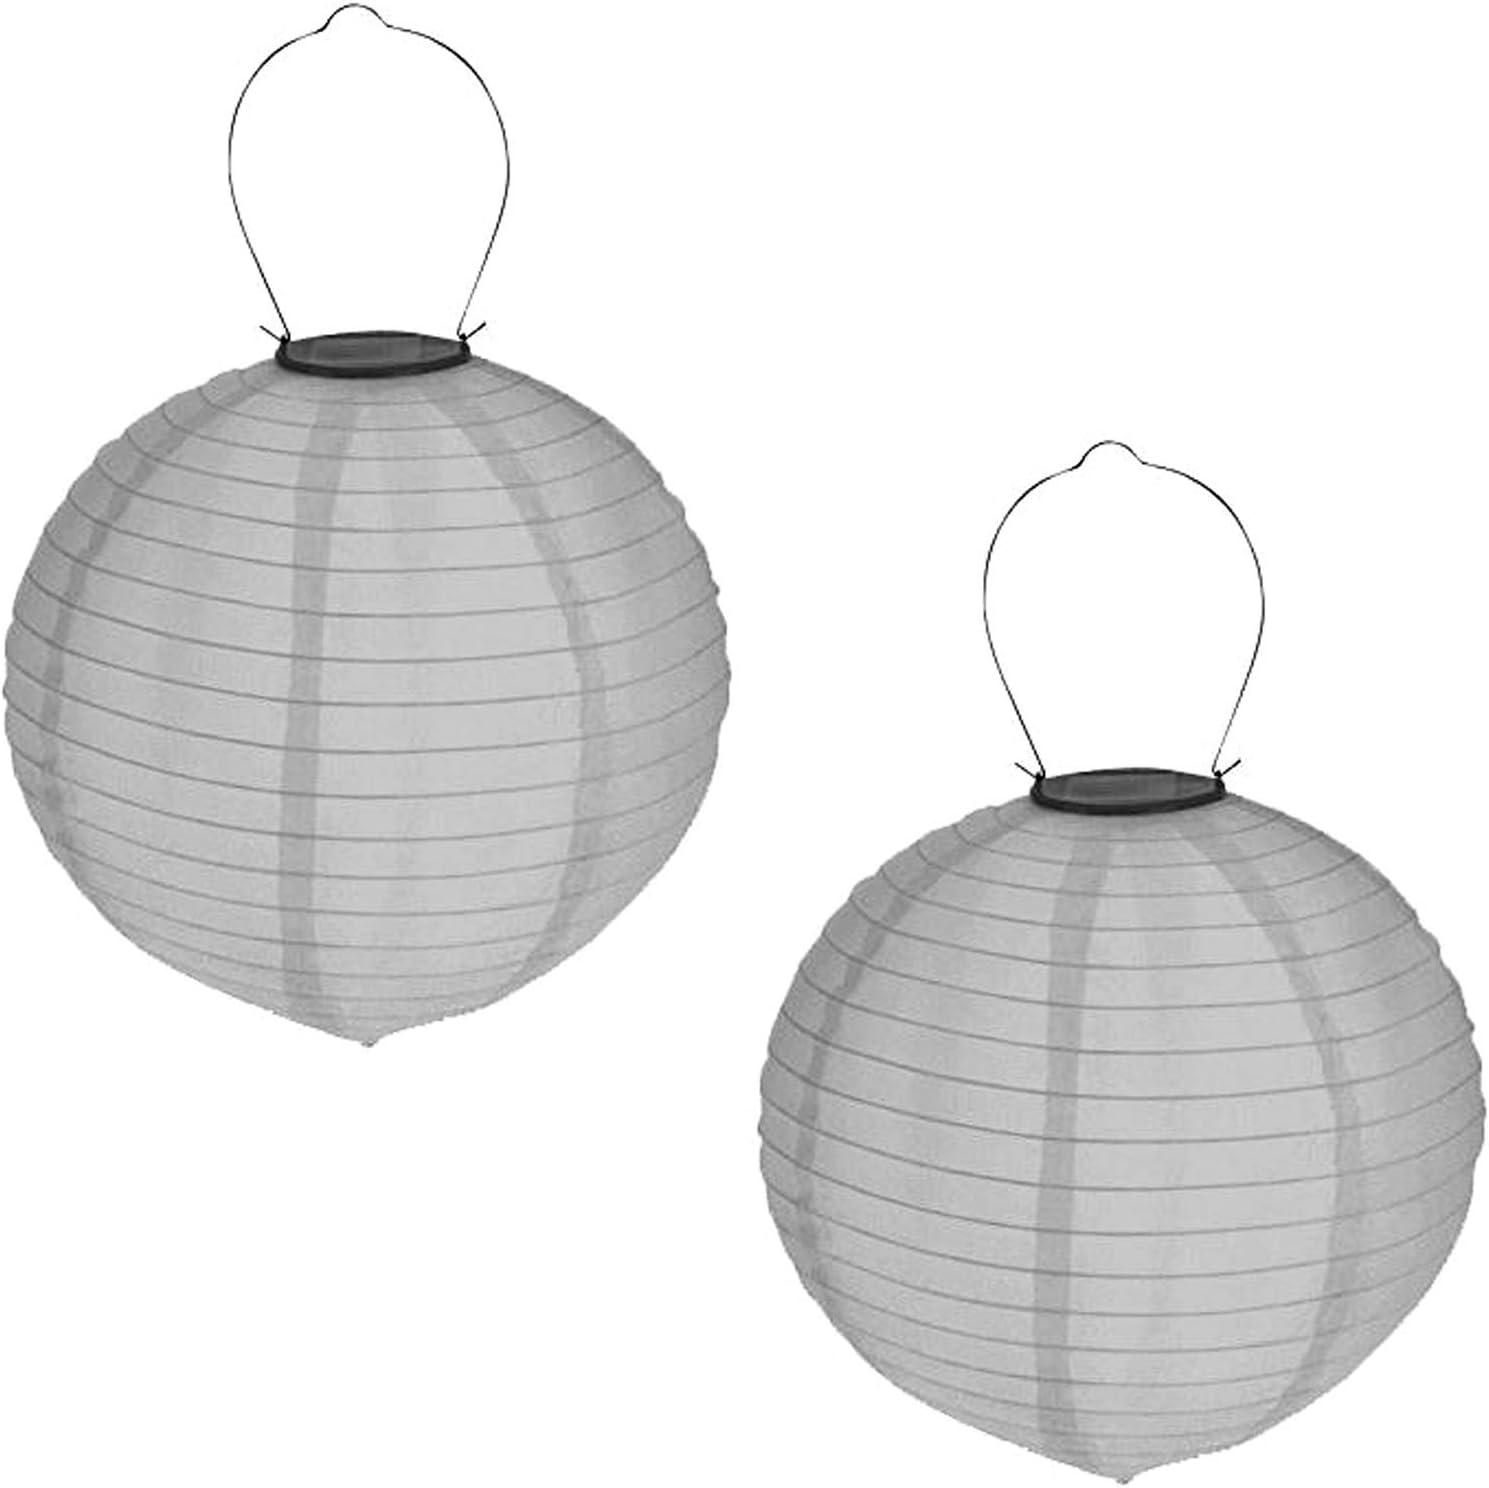 2er Set Solar LED Lampion Party Garten Laterne /ø 20cm Wei/ß Deko Lampenschirm Lampe Kugel Gartenlampion